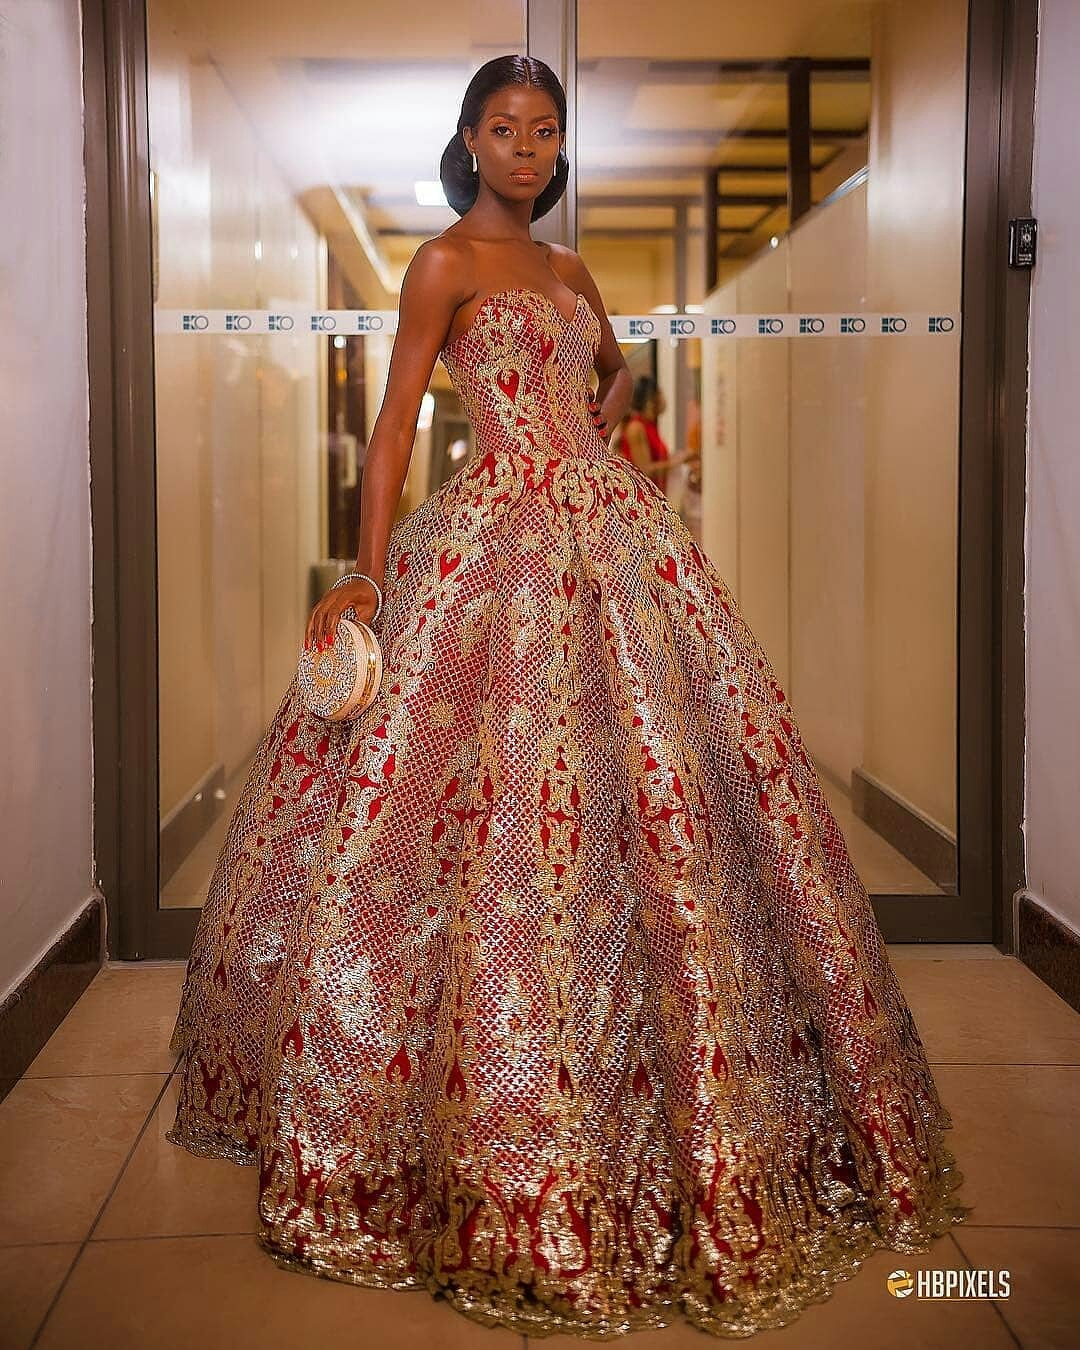 KokobyKhloe dress AMVCA 2018